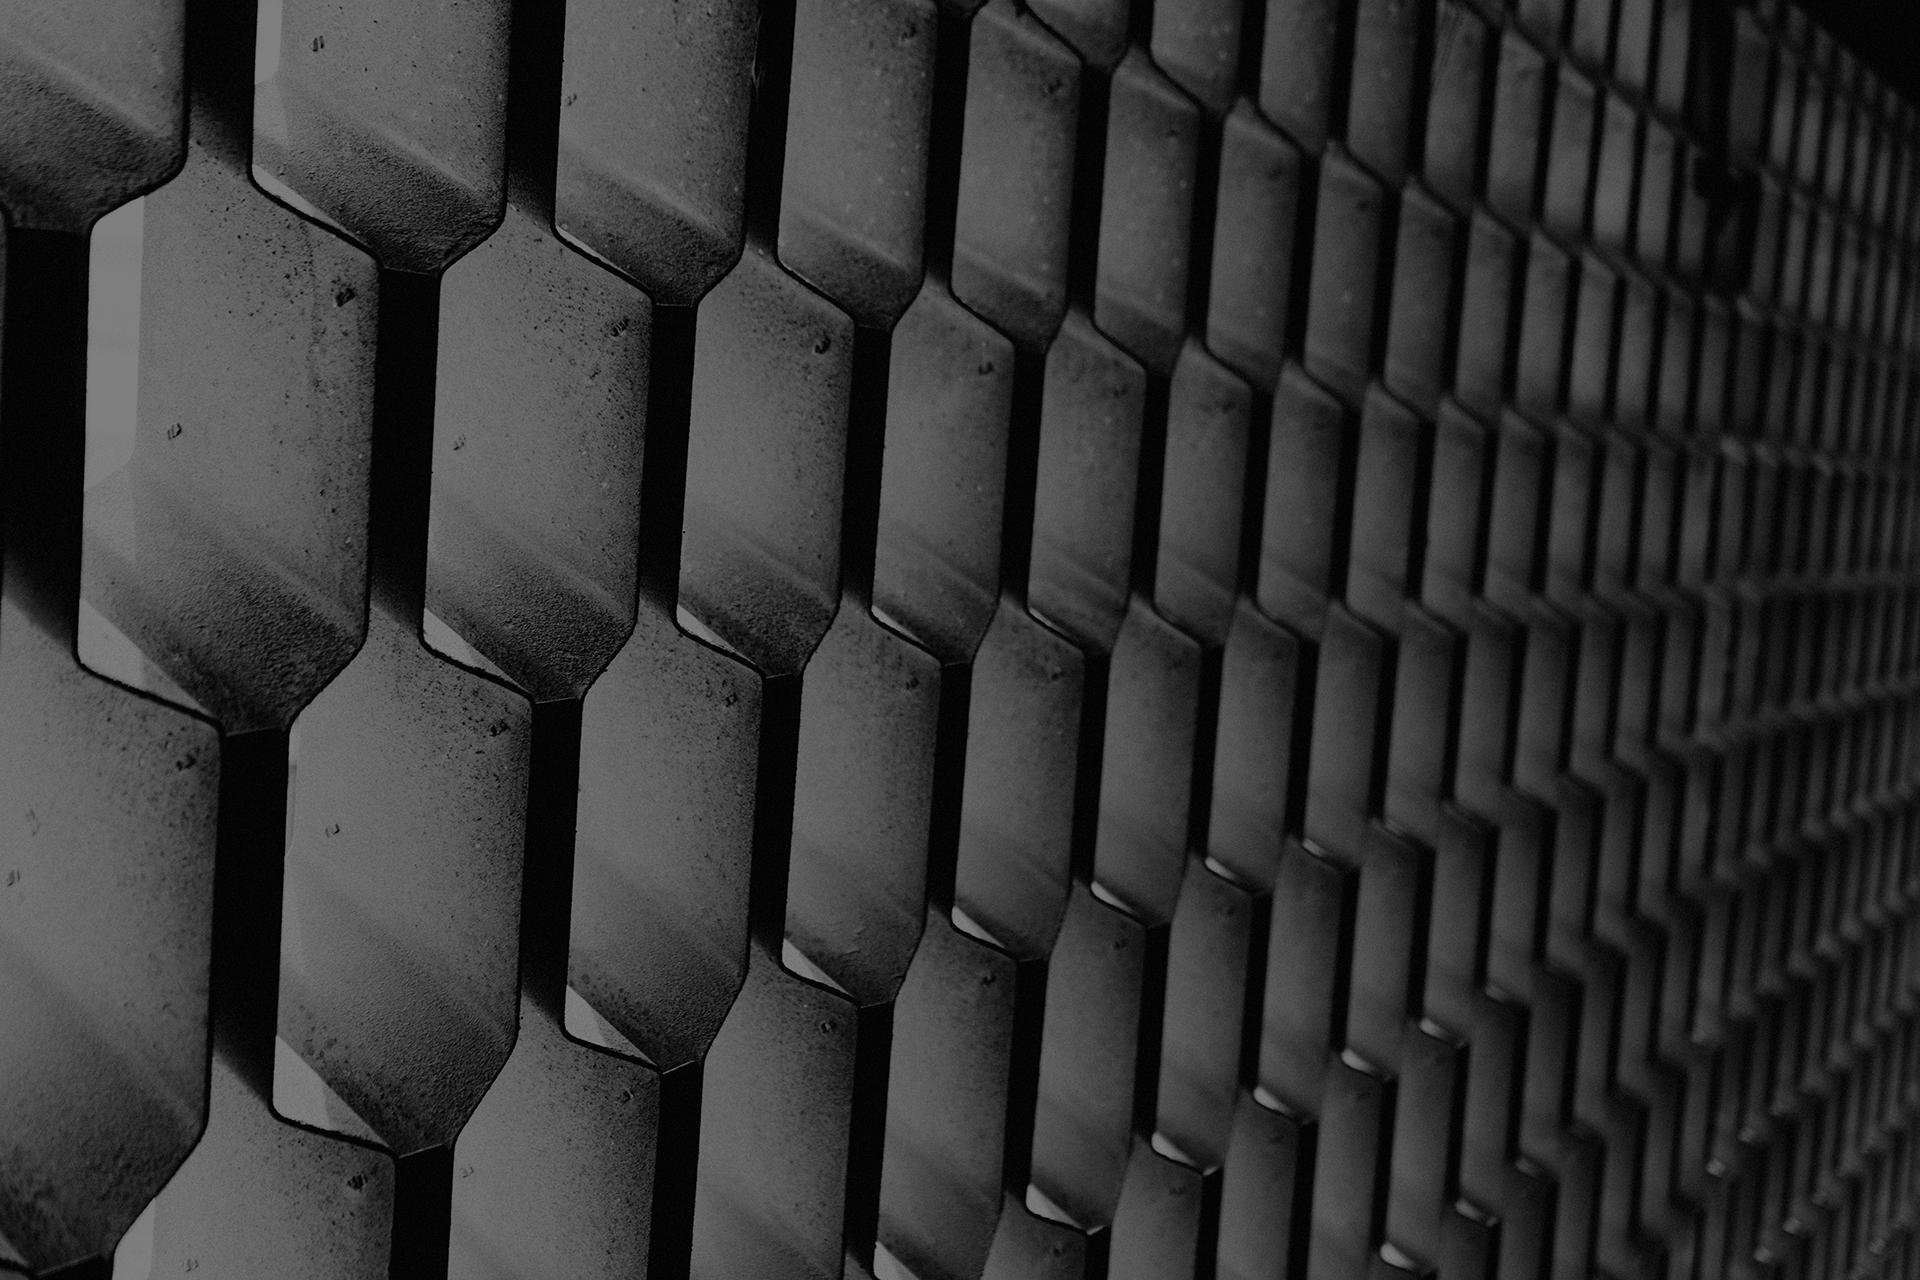 moorhouse-construction-metal-pattern